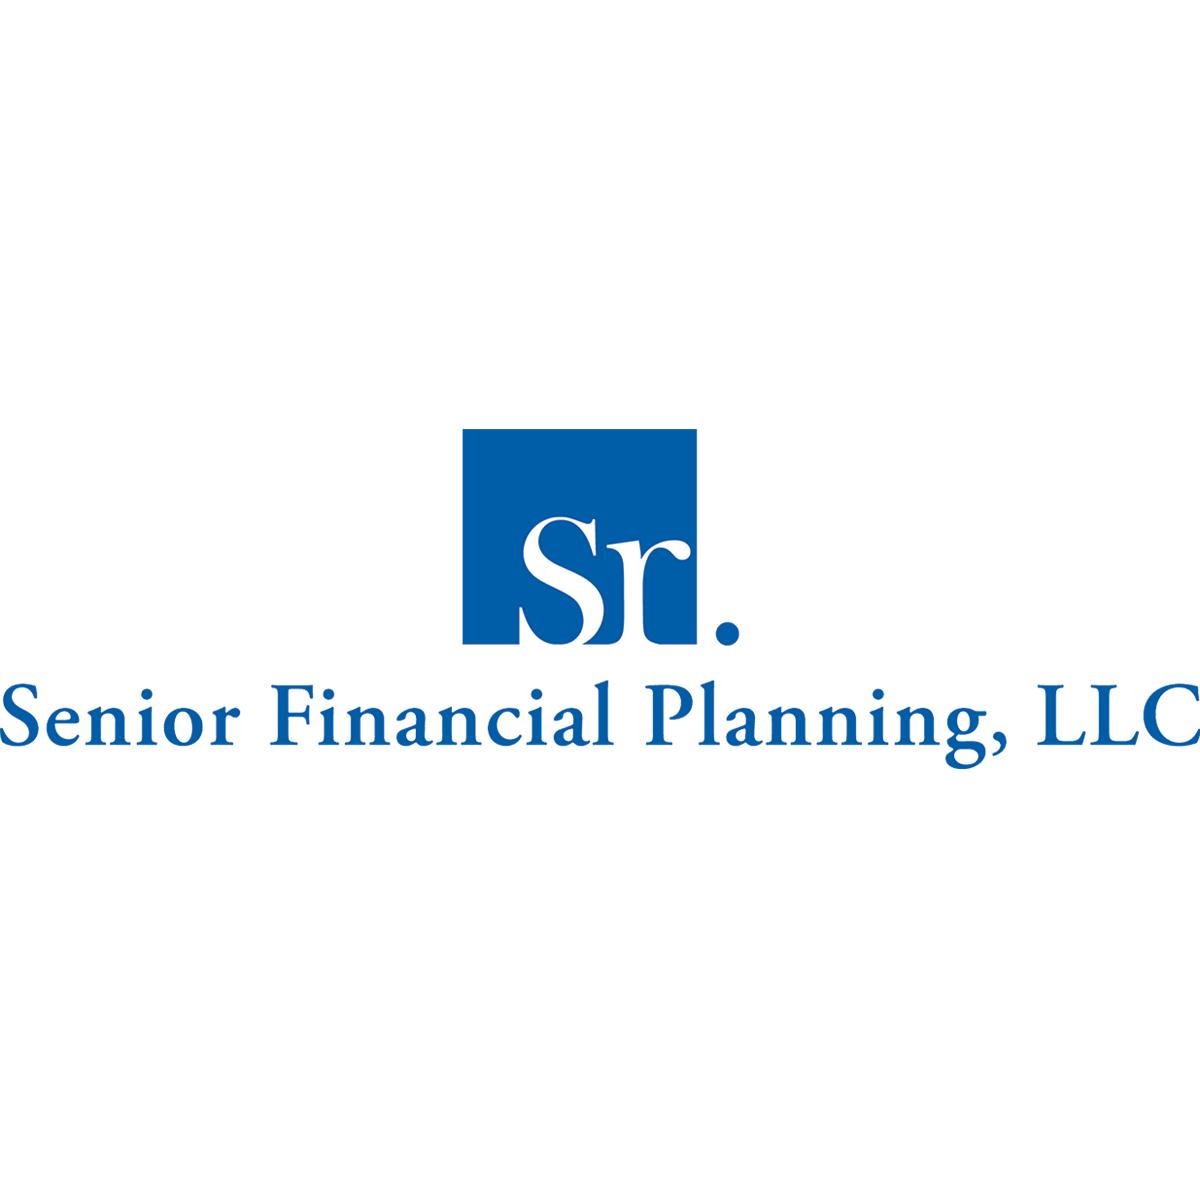 Senior Financial Planning, LLC - Marietta, GA - Financial Advisors